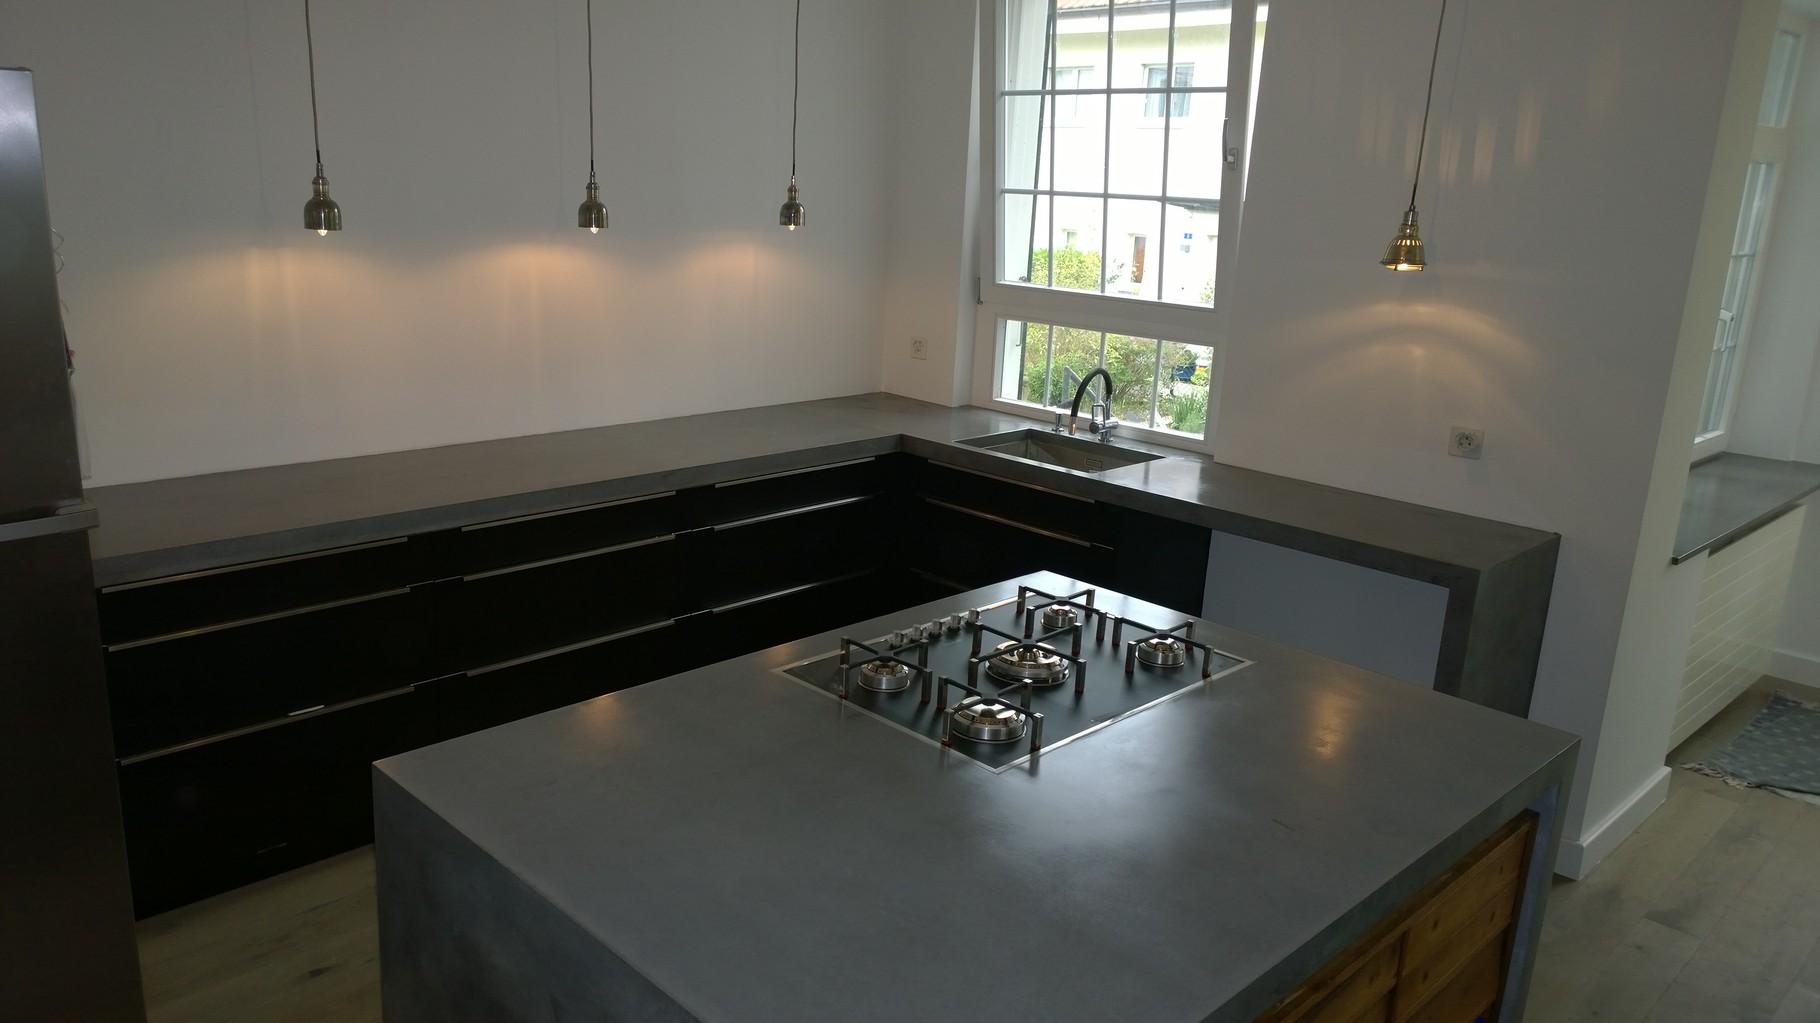 Beton Küche, Kochinsel aus Beton,